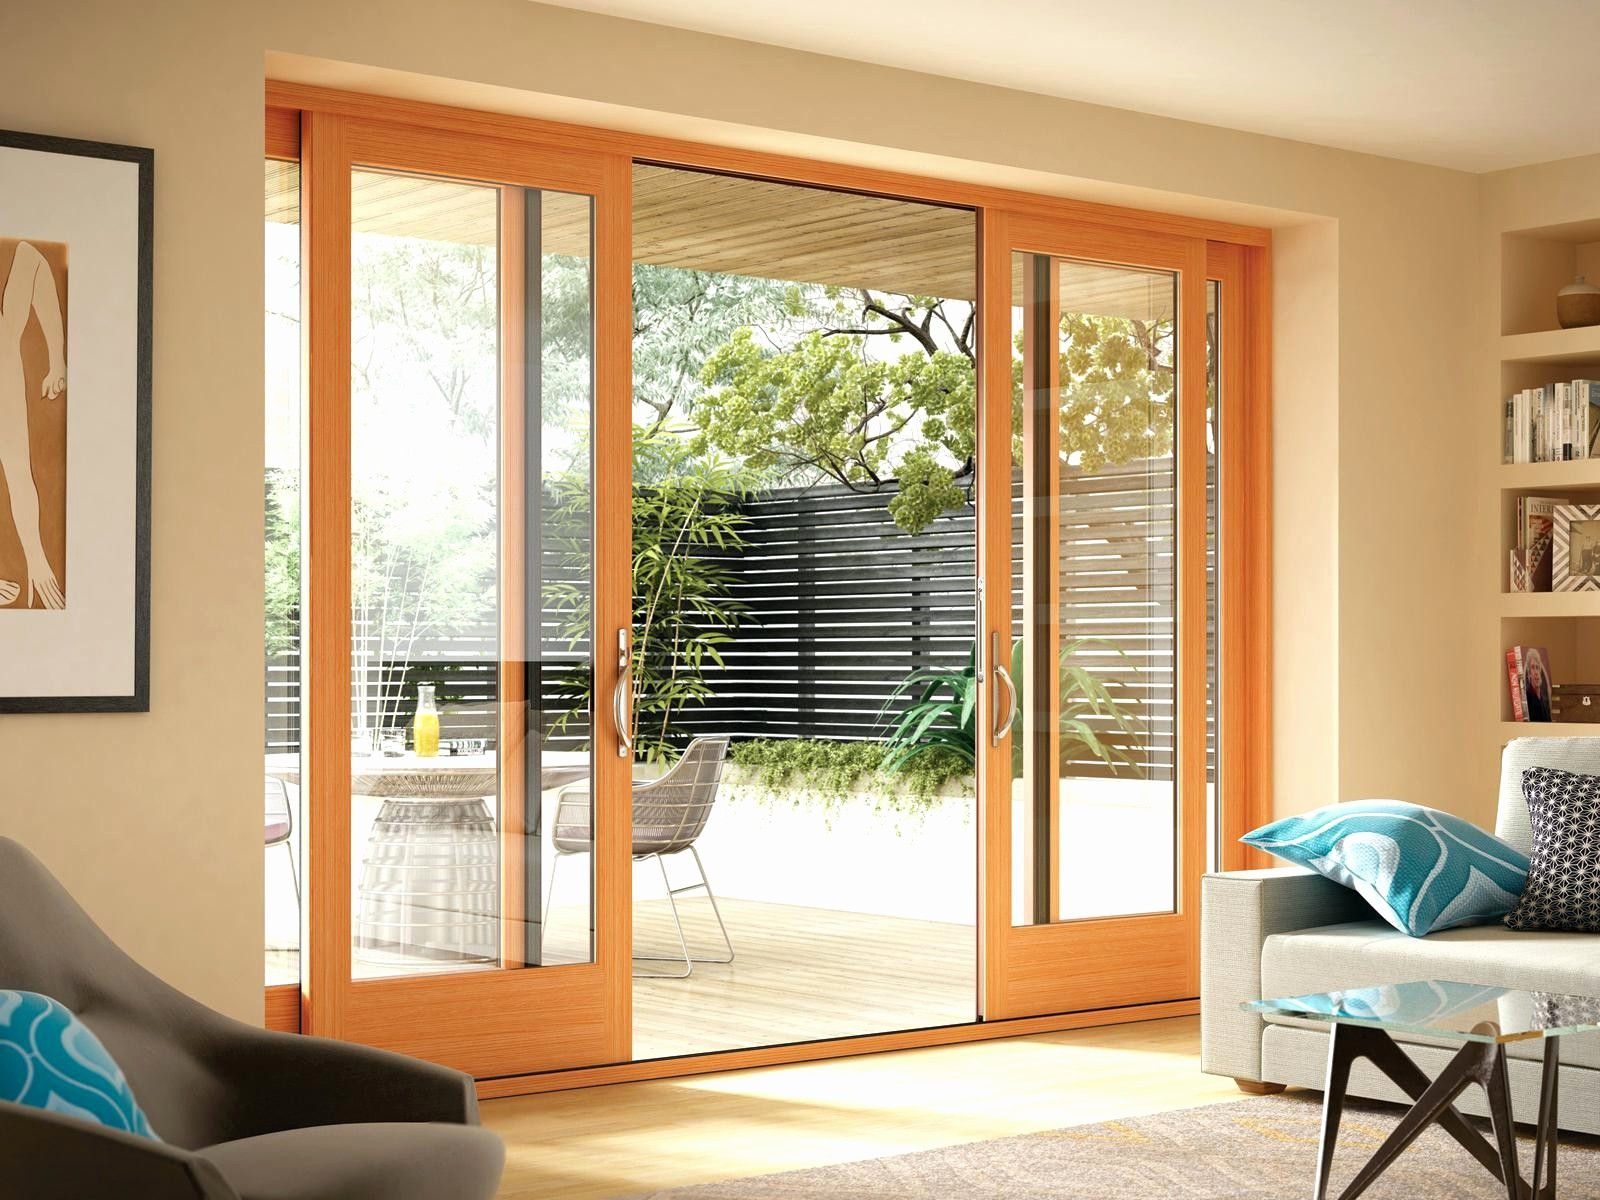 Pocket French Doors Exterior And Inspirational 8 Foot Wide Sliding Patio Doors Elegant 50 New Patio Scree French Doors Exterior Sliding Patio Doors Patio Doors